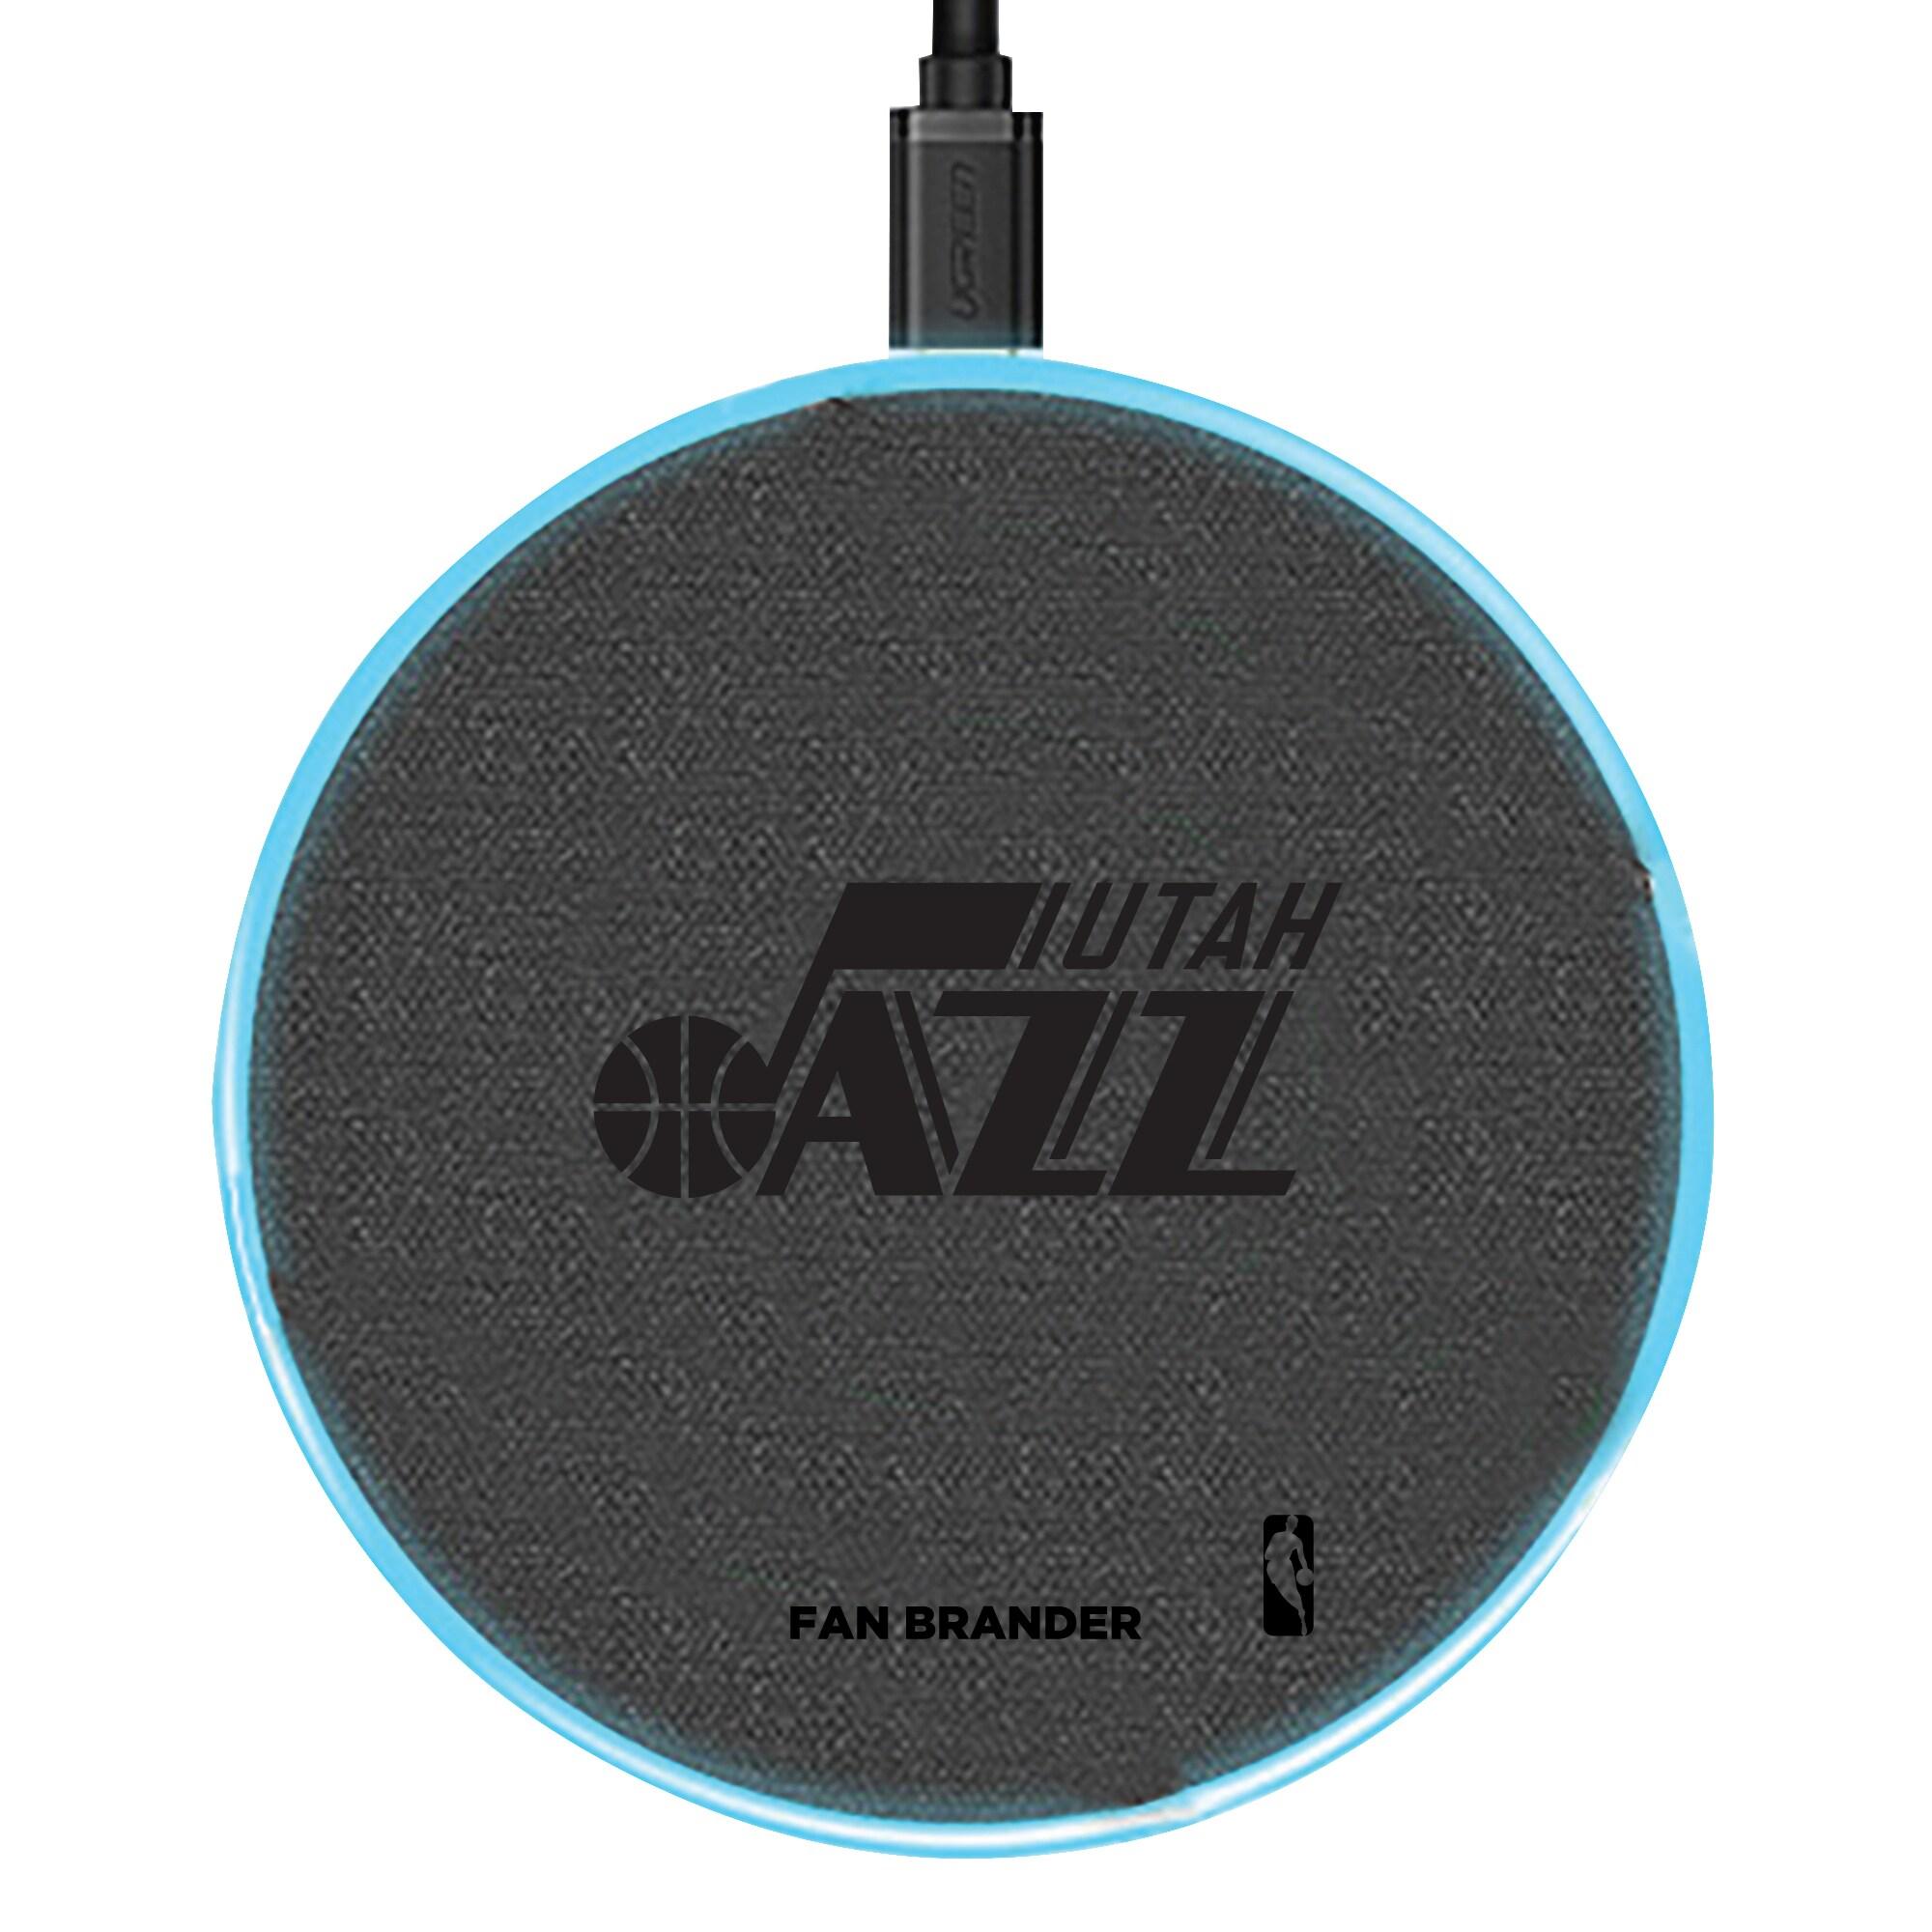 Utah Jazz 15W Laser Etched Wireless Charging Base - Gray